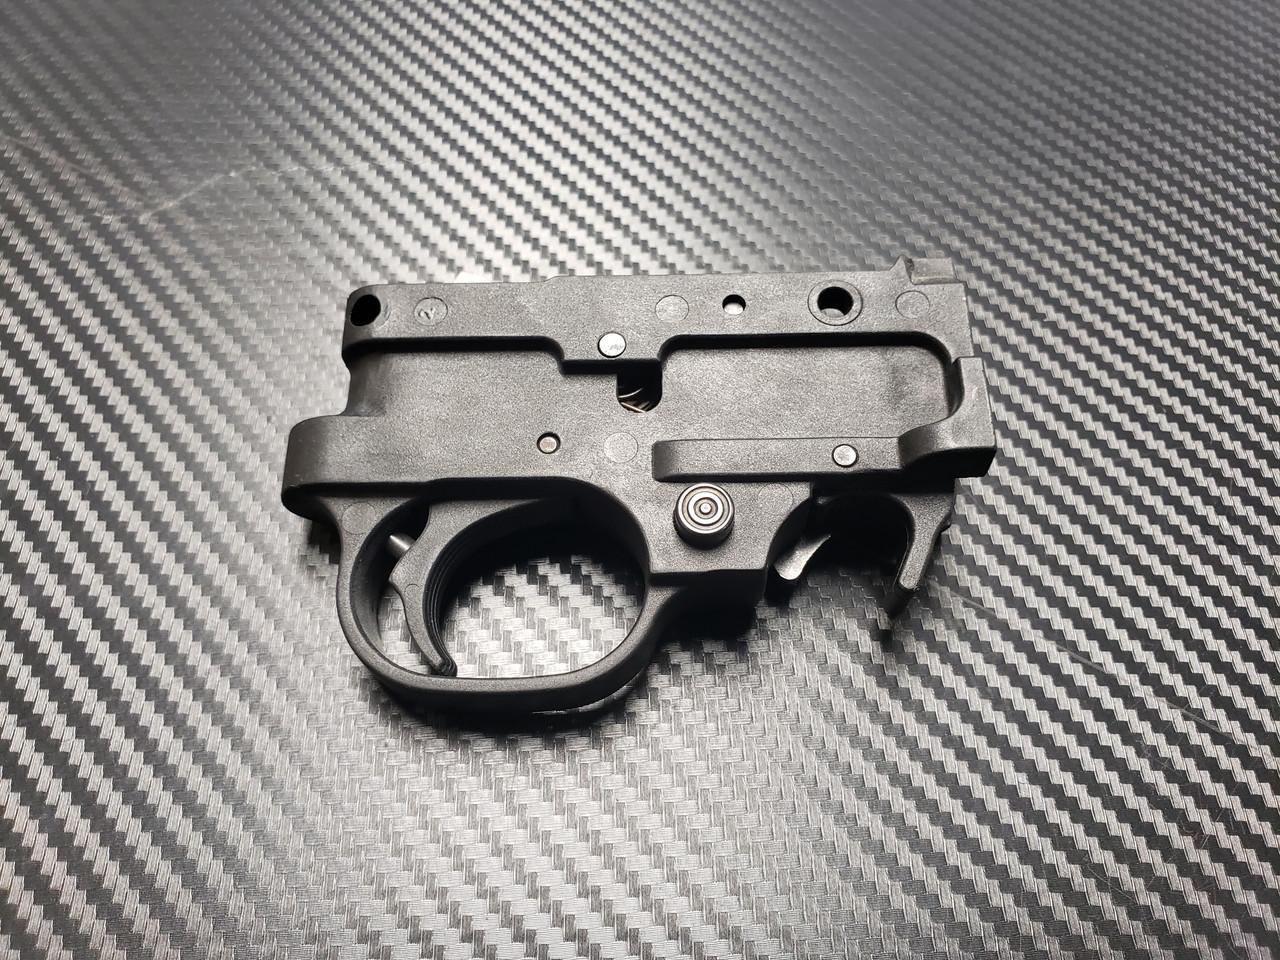 Ruger 10/22 Factory Trigger Group